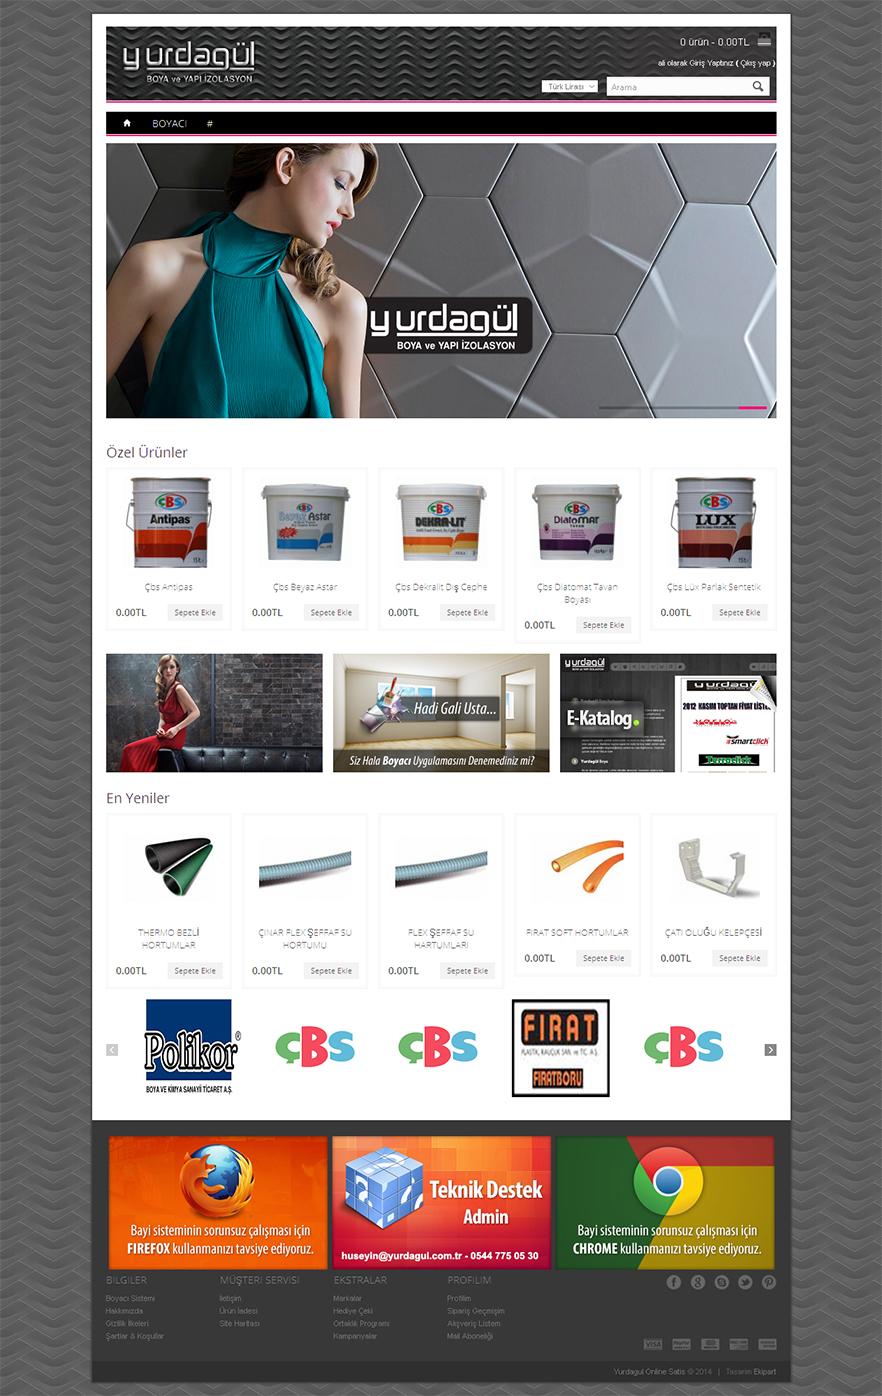 yurdagul-online-satis-3